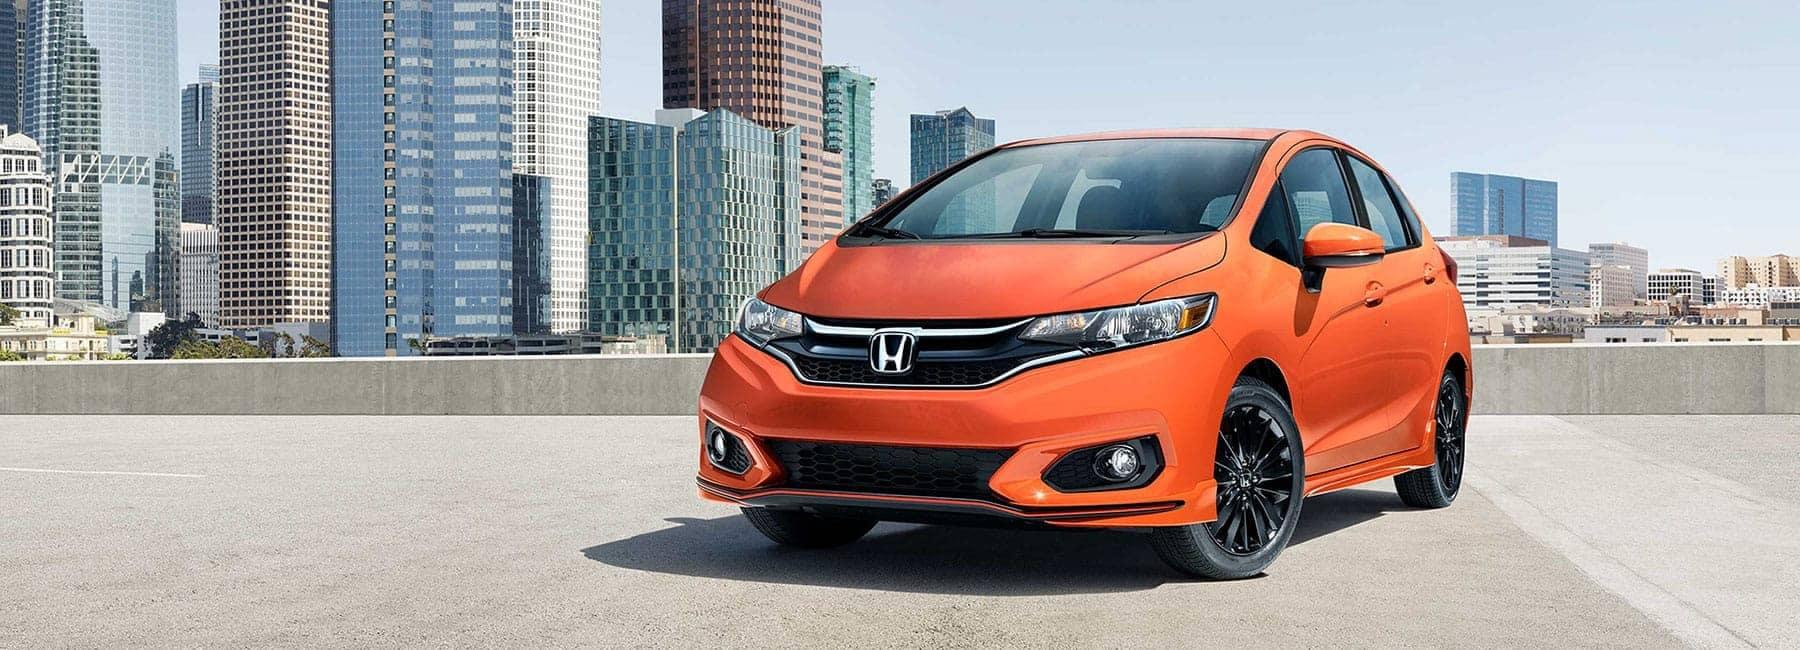 Honda Dealership Orange County >> Nalley Honda Dealership Near Jacksonville Florida